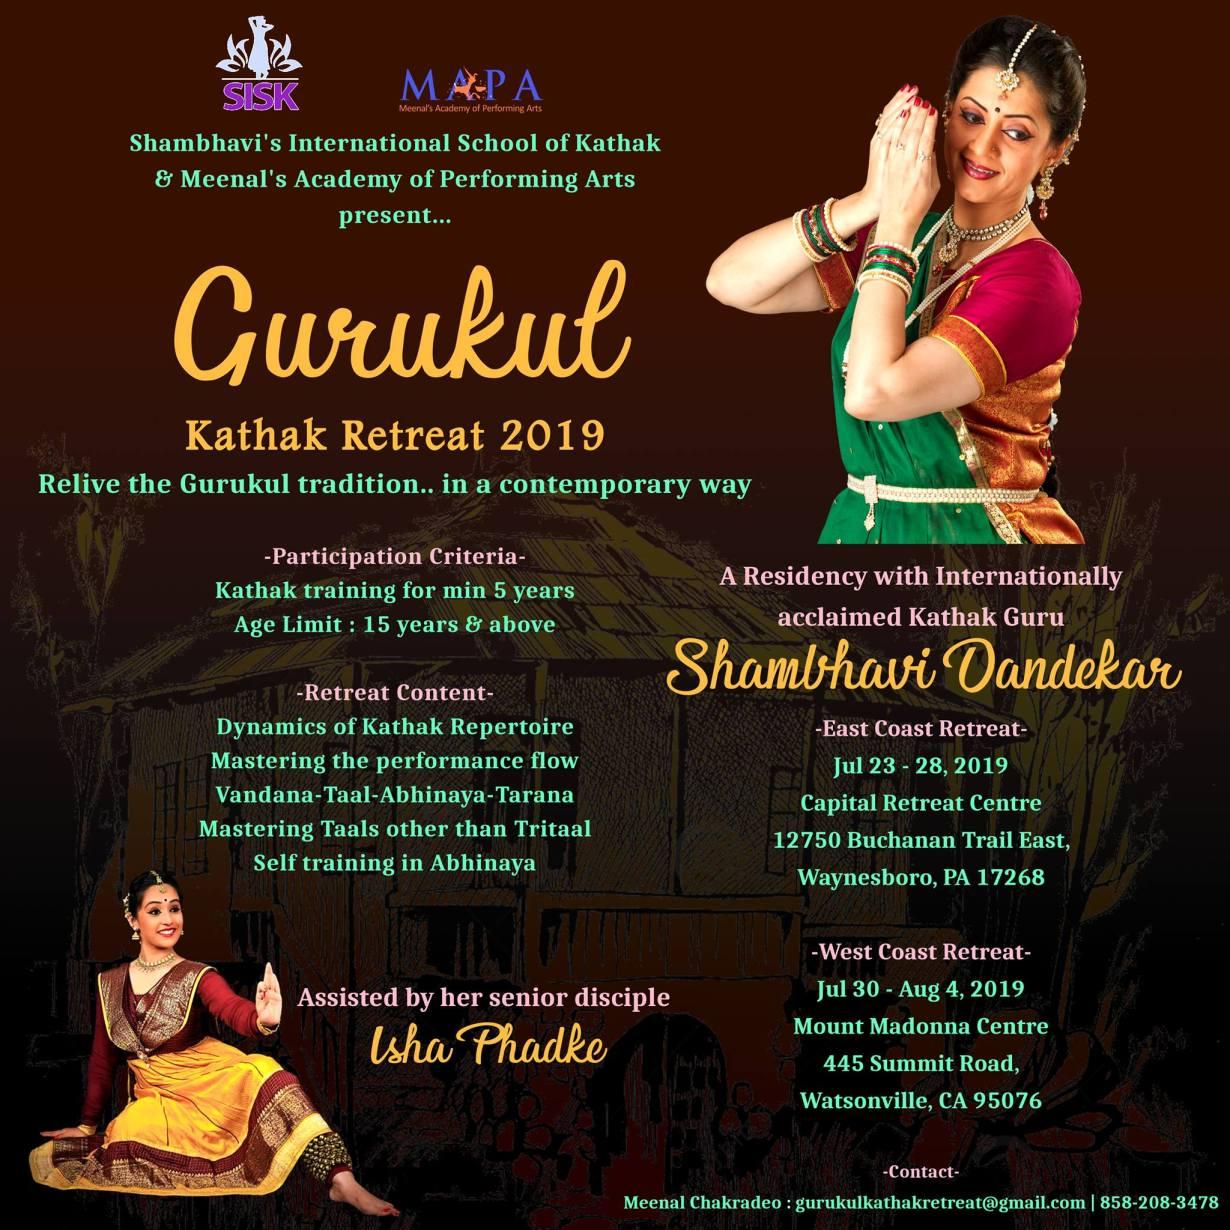 Gurukul Kathak Retreat 2019